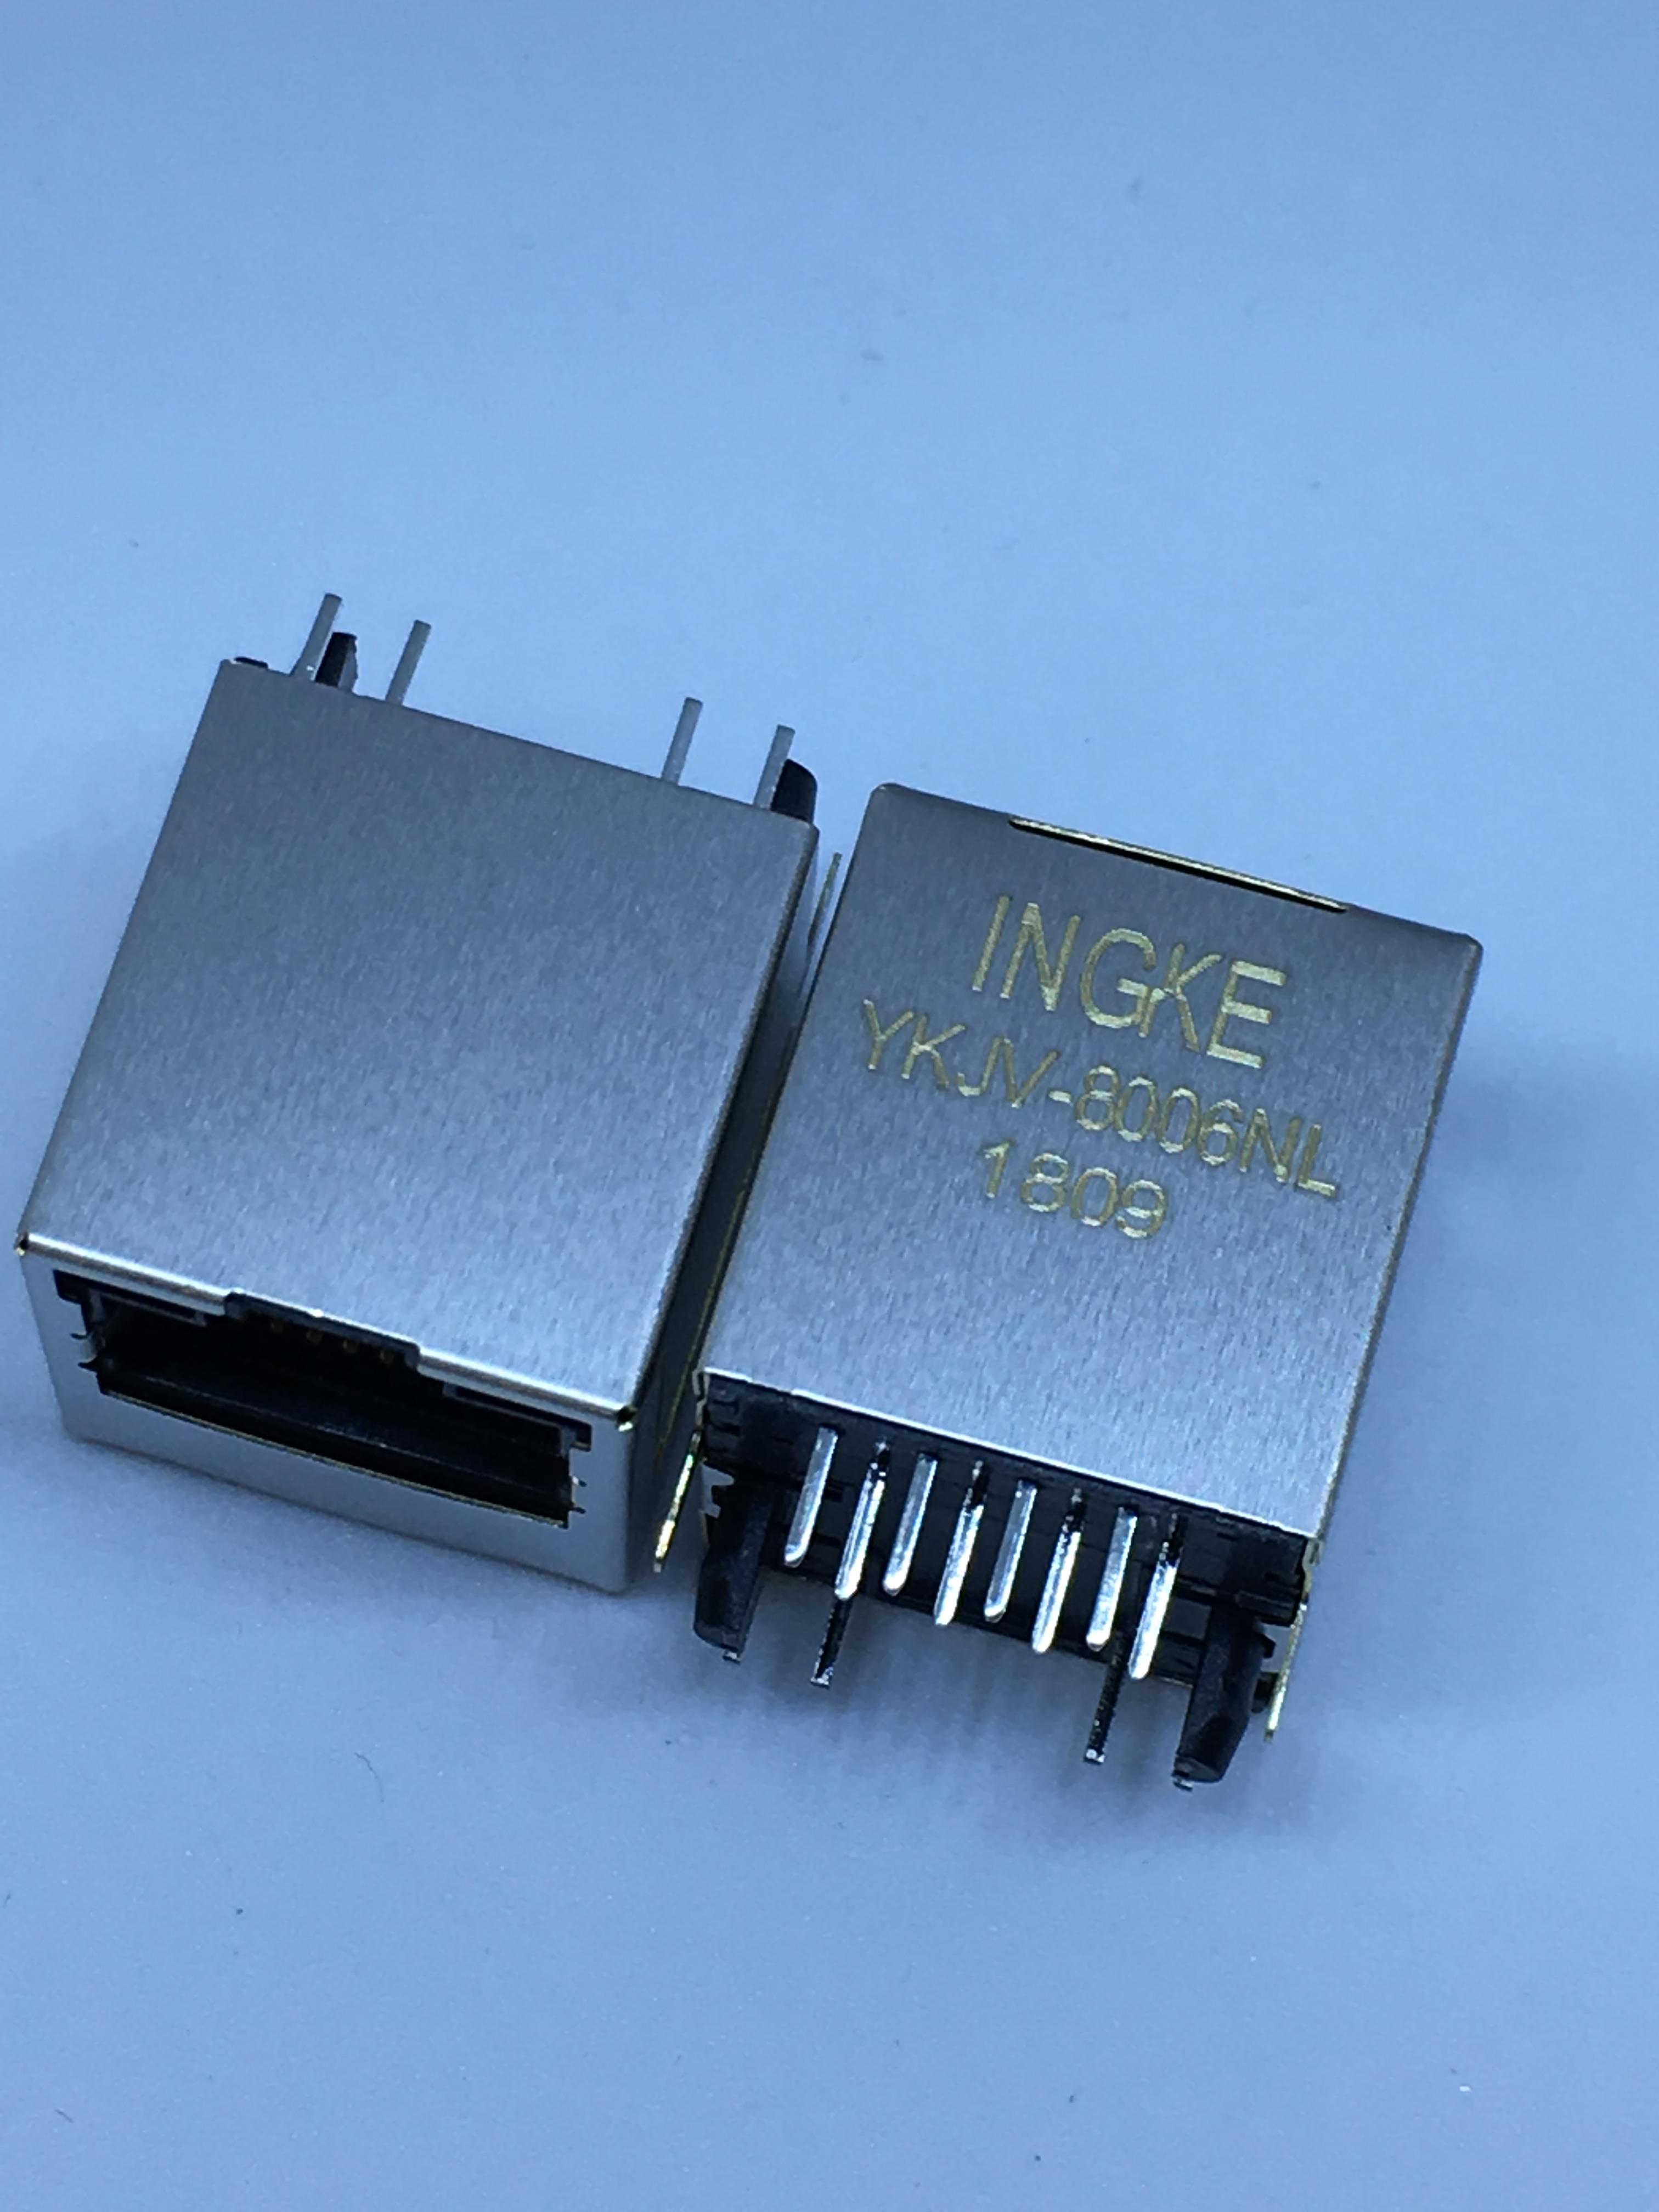 SI-46001-F YKJV-8006NL Vertical RJ45 Magjack Connectors